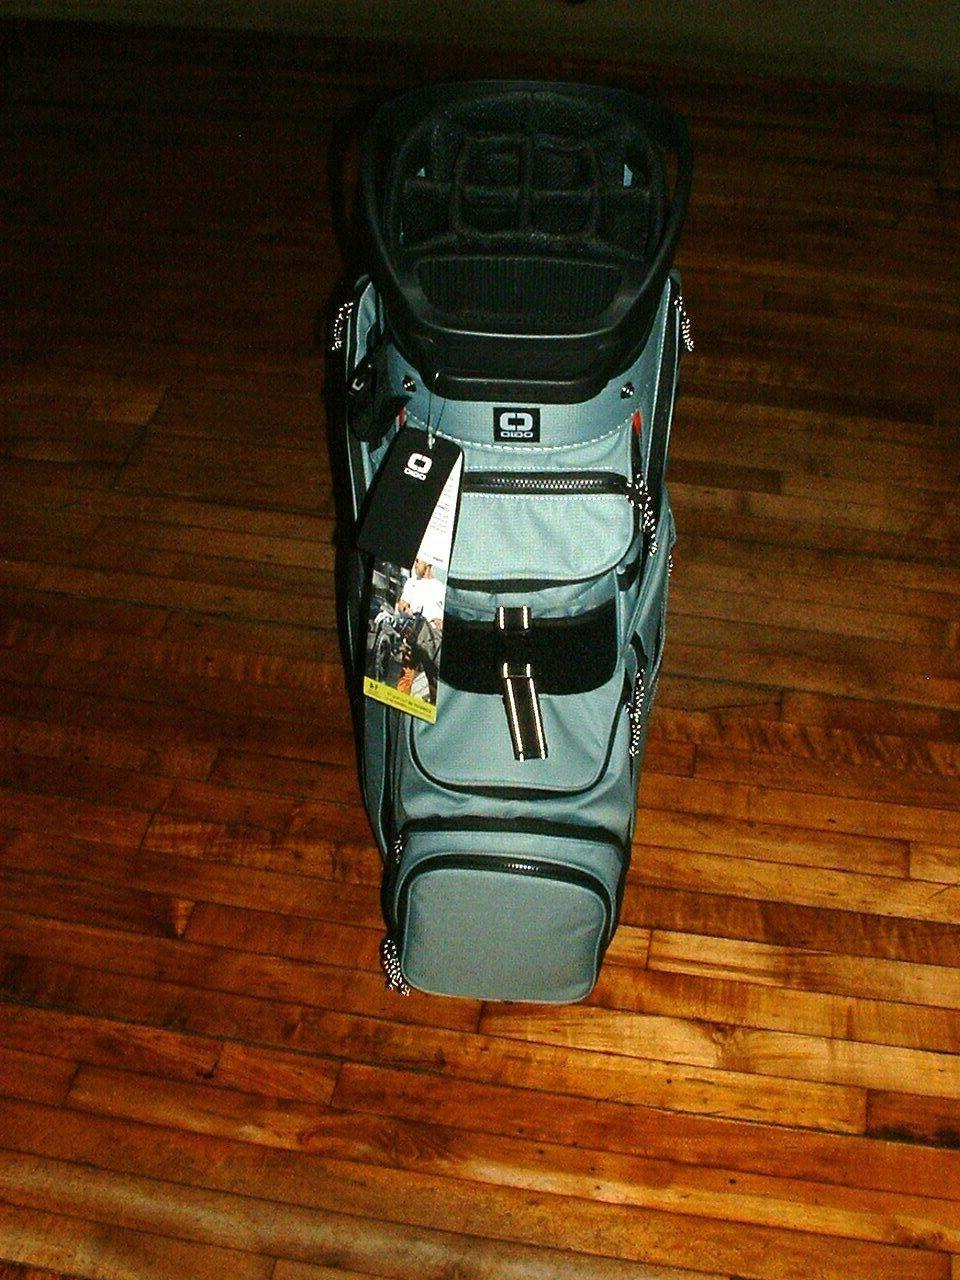 OGIO Cart Bag LIghtweight, Great New